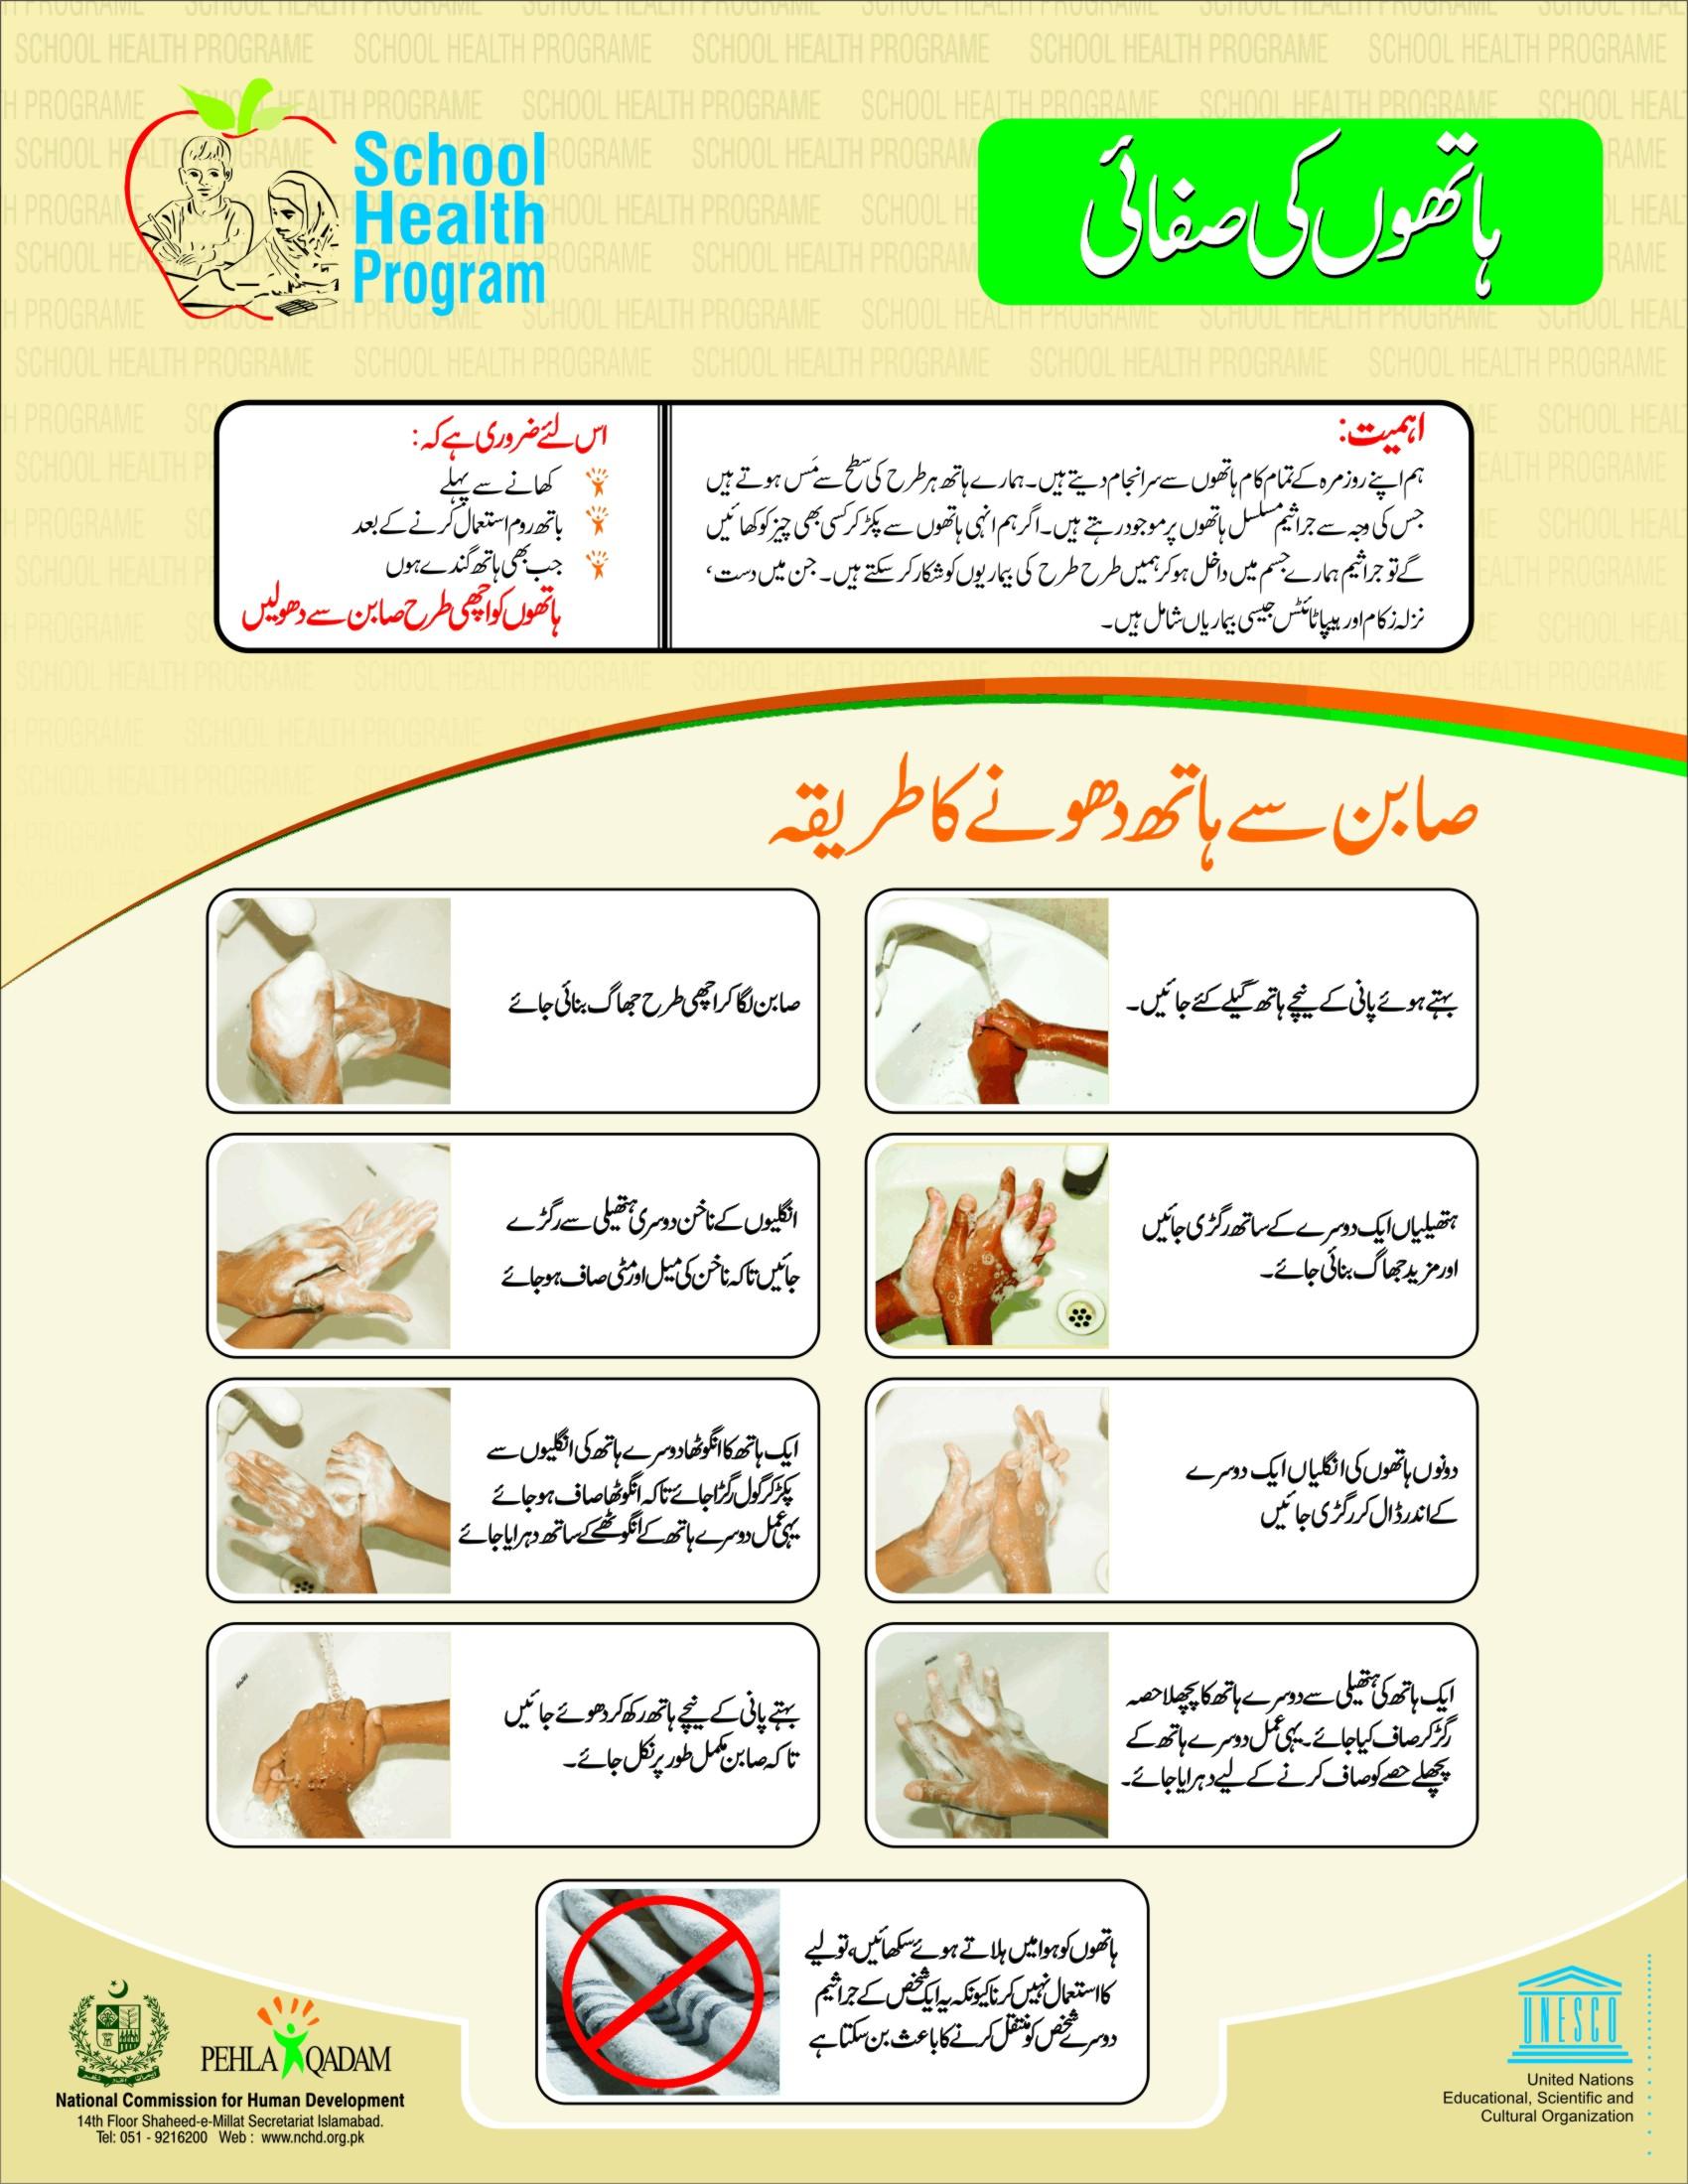 School Health Program